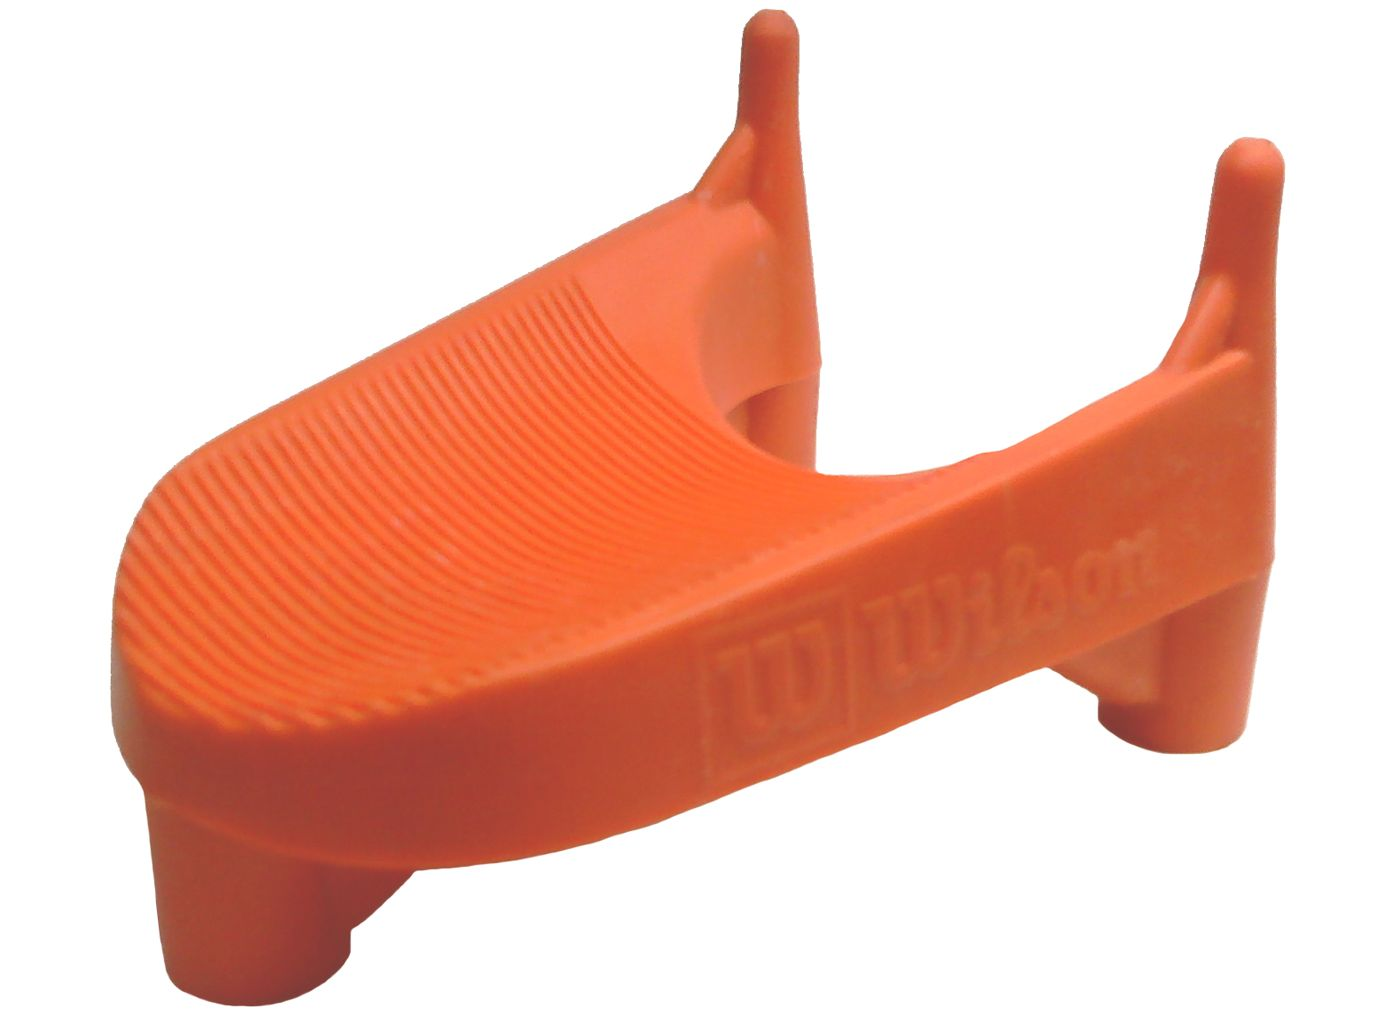 "Wilson 1"" Orange Rubber Football Kicking Tee"